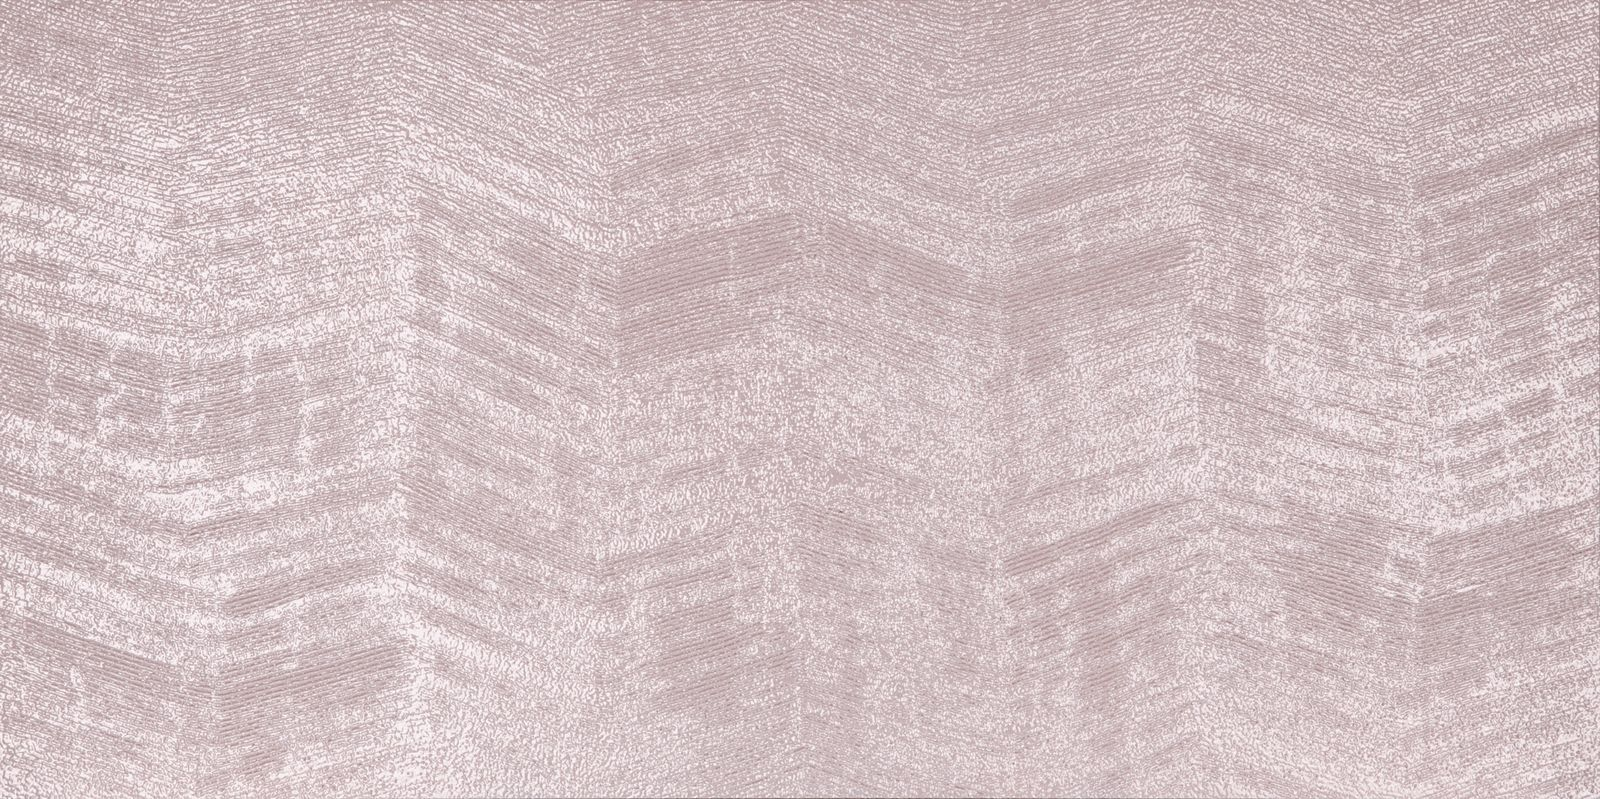 Плитка SOFT PINK Soft pink (znxsw7r) изображение 2